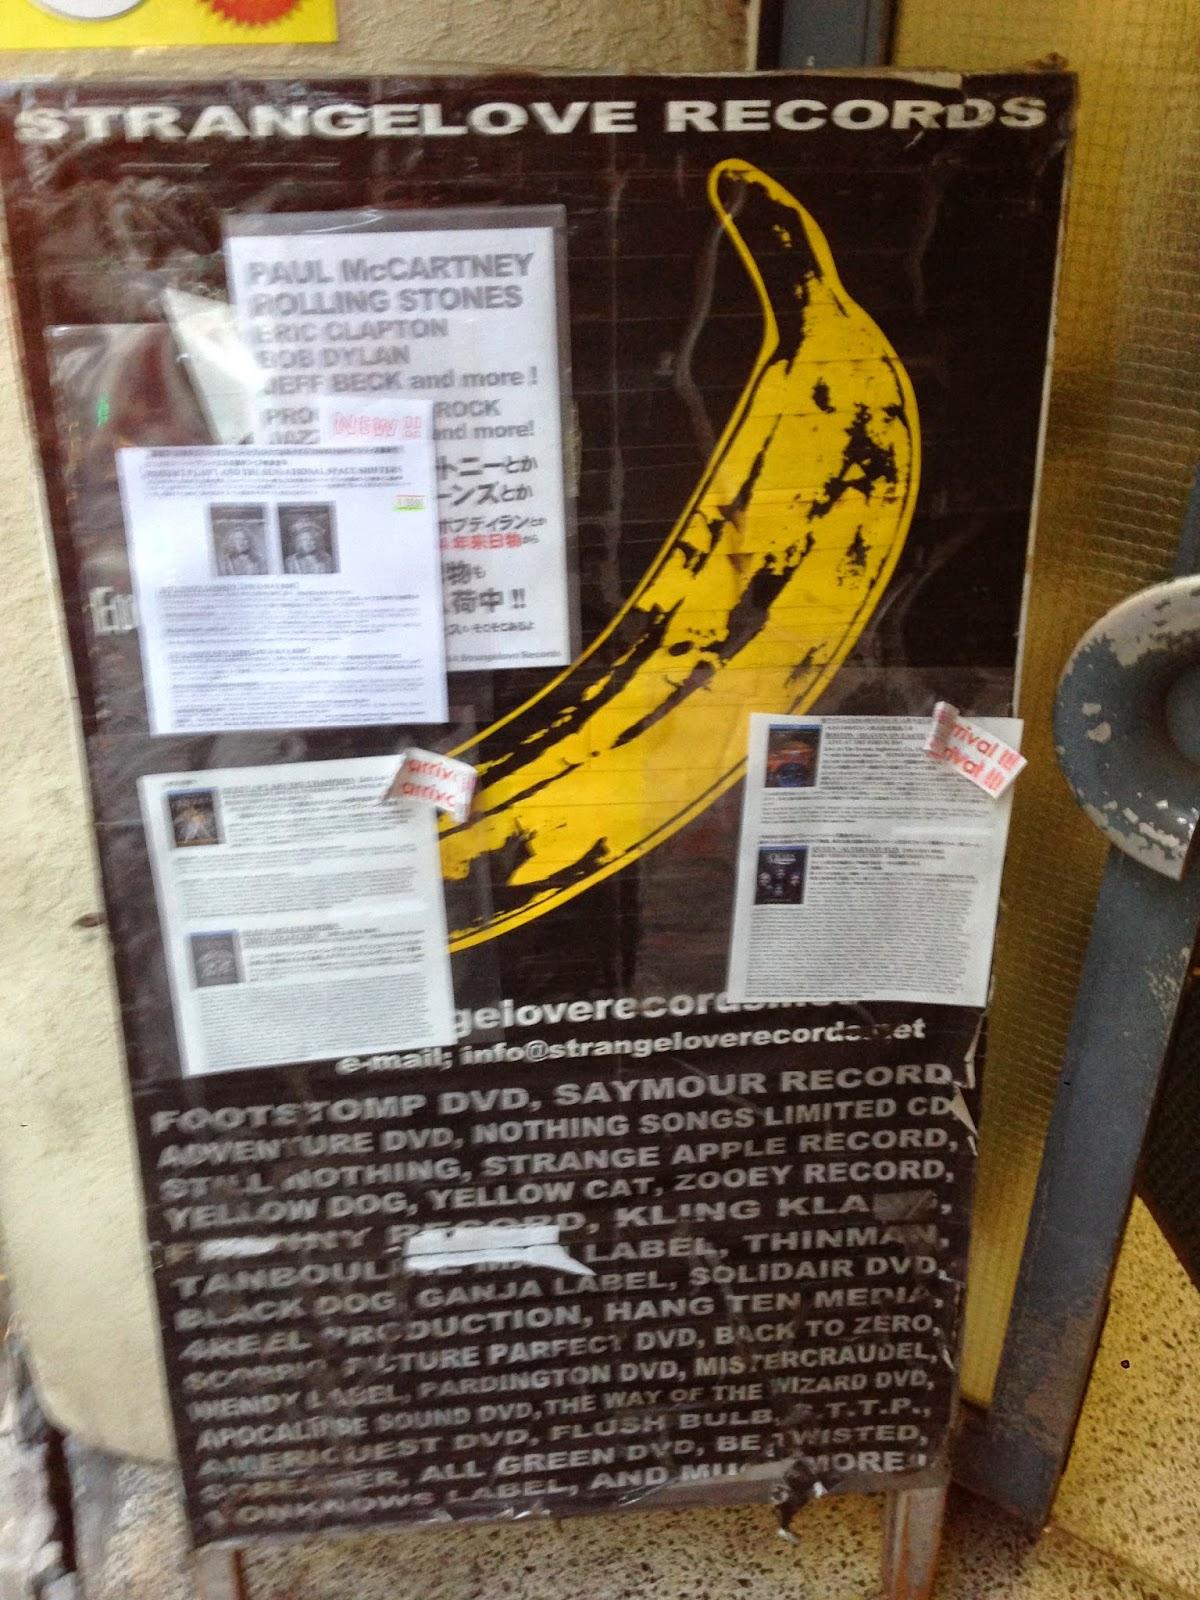 Strangelove Records Shinjuku